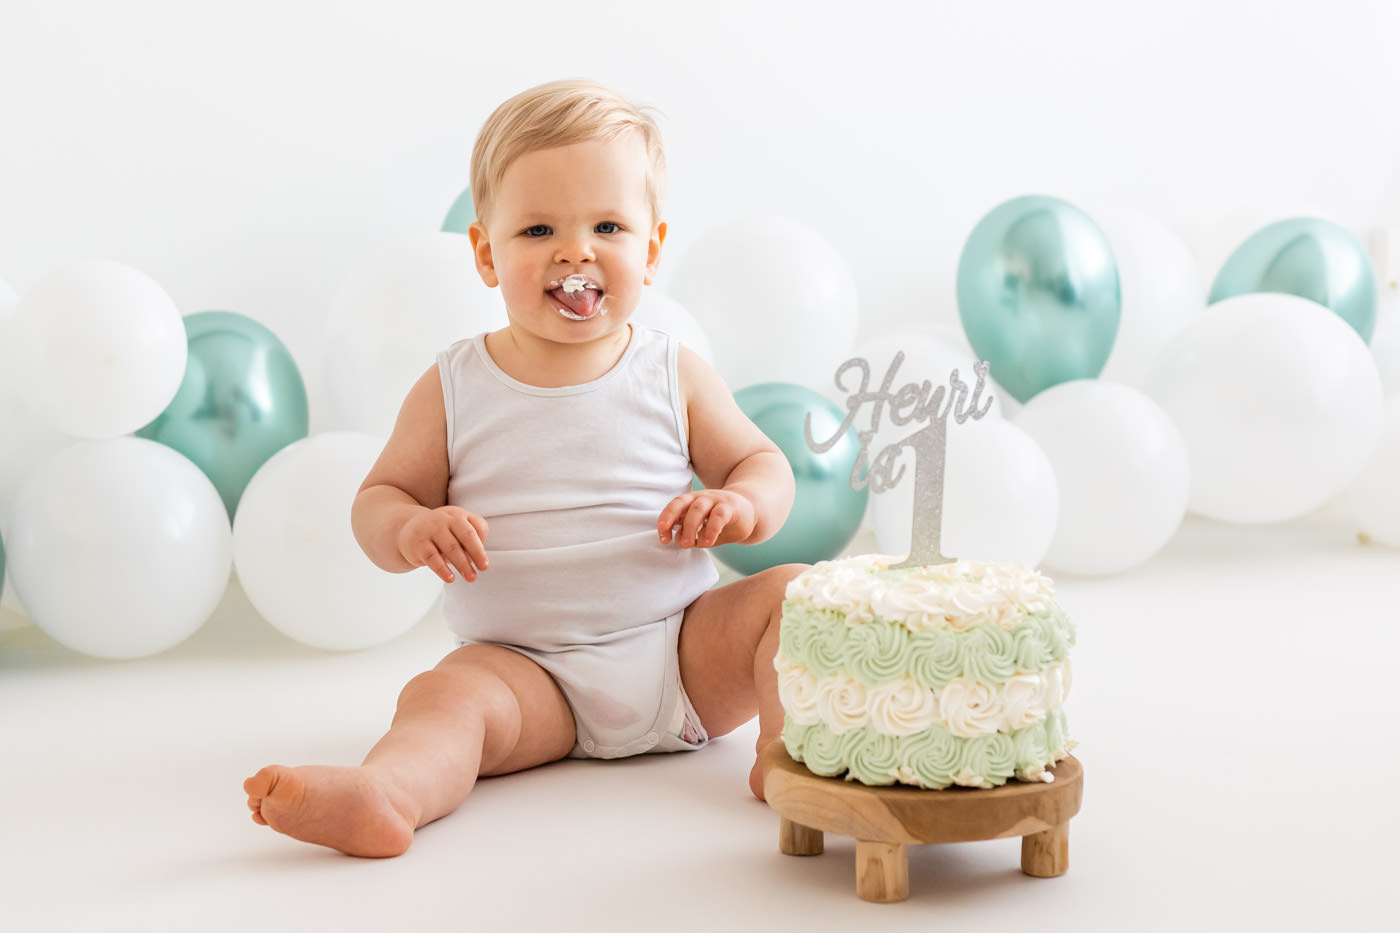 séance photo smash cake à metz